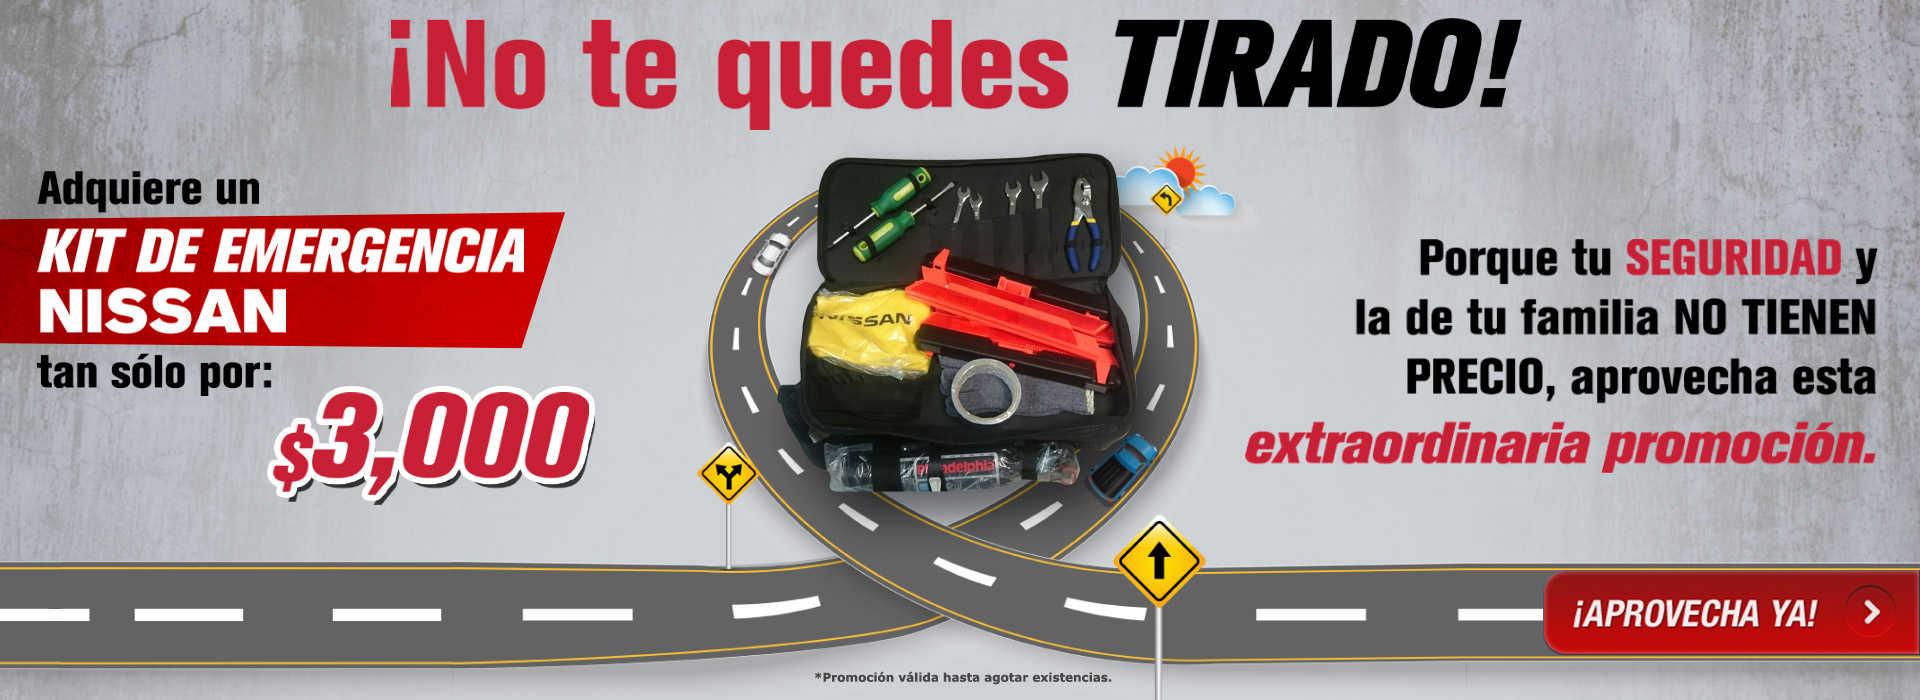 No te quedes tirado - Kit de Emergencia Nissan